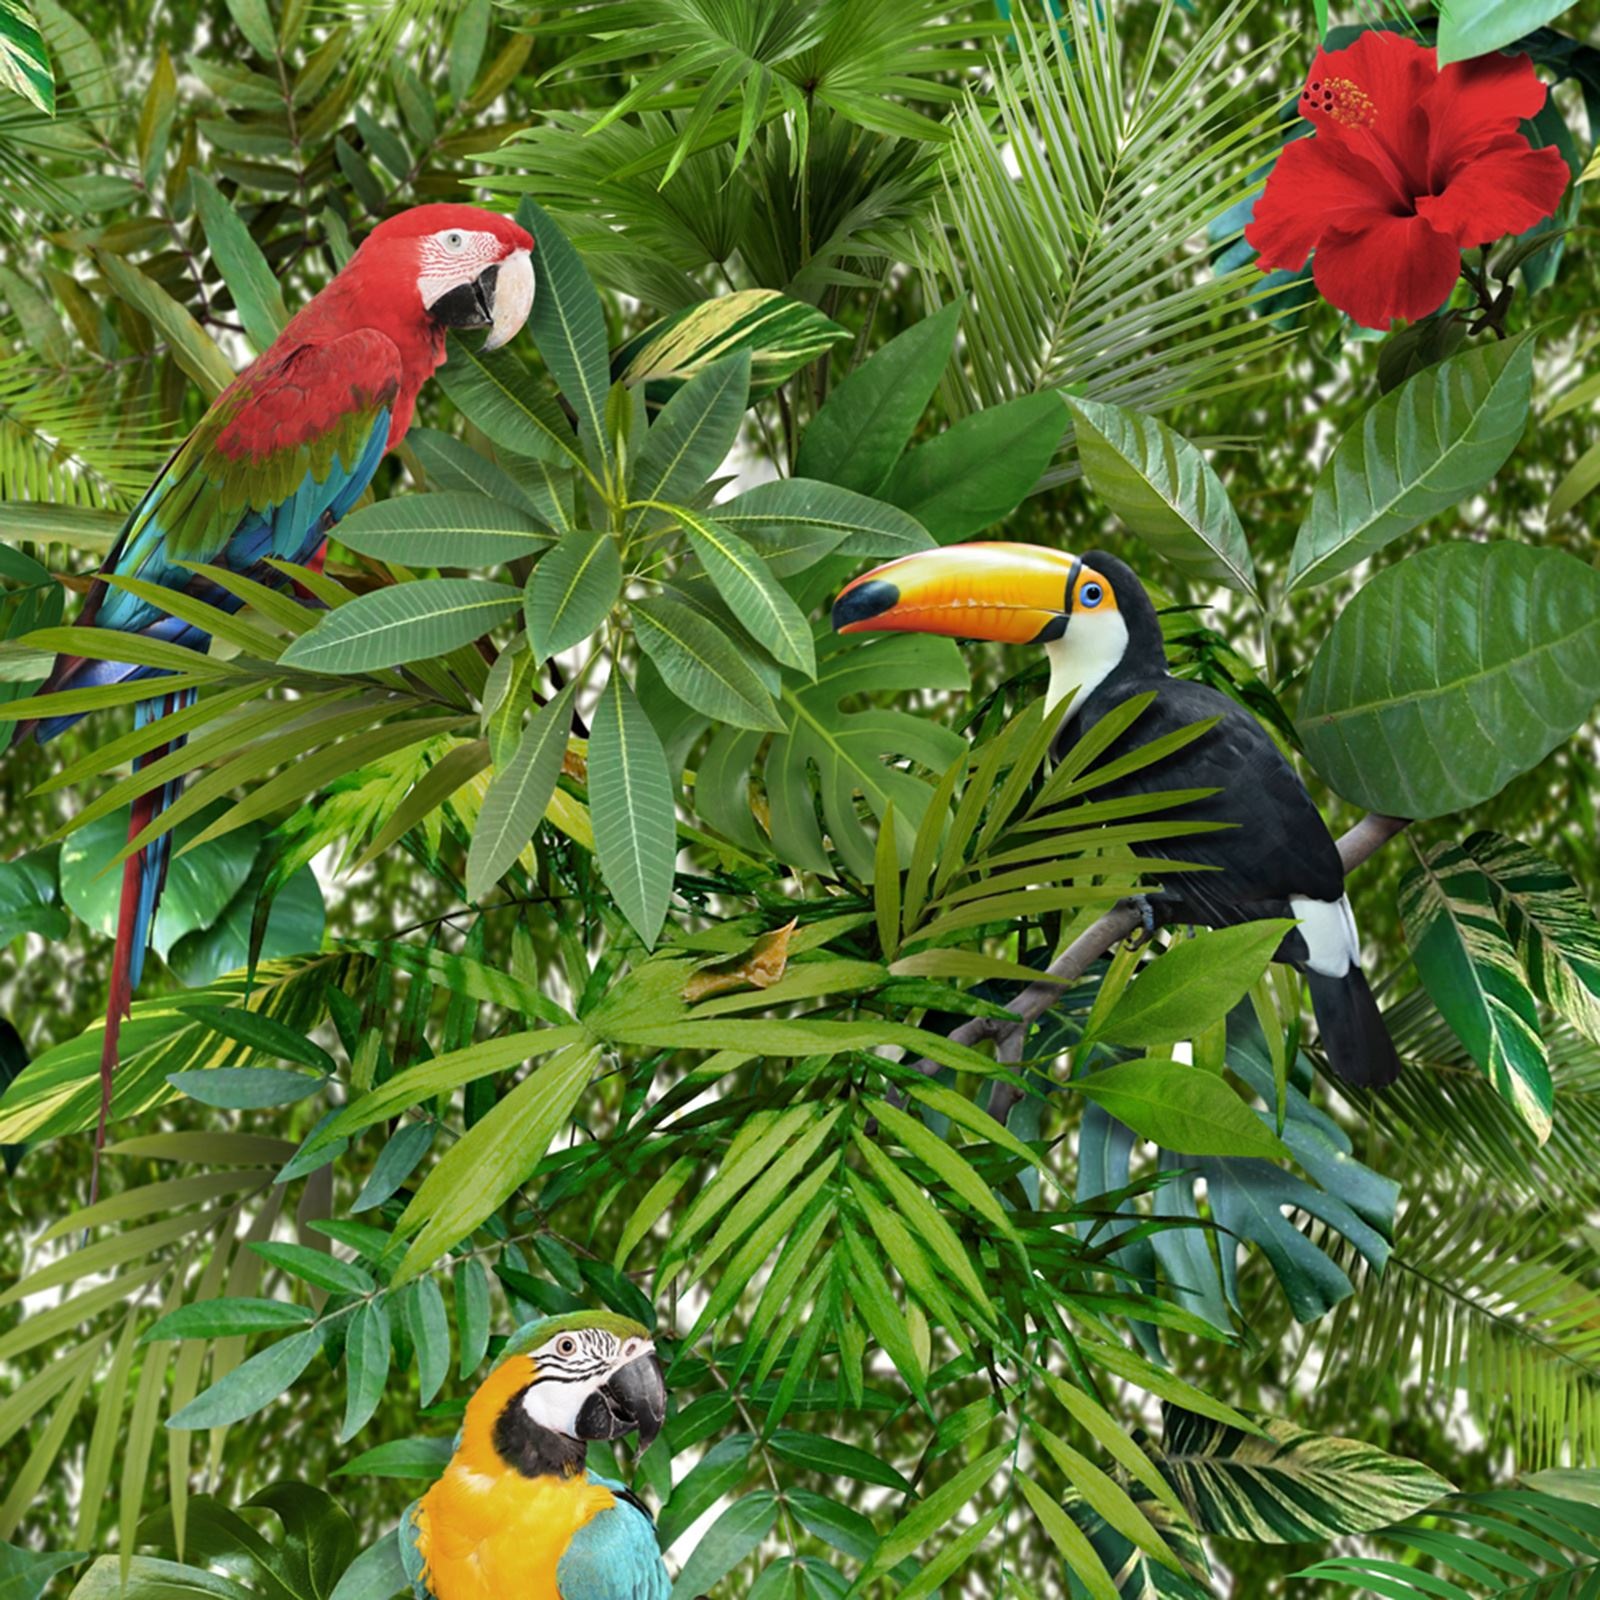 tropical bird wallpaper for walls - photo #1